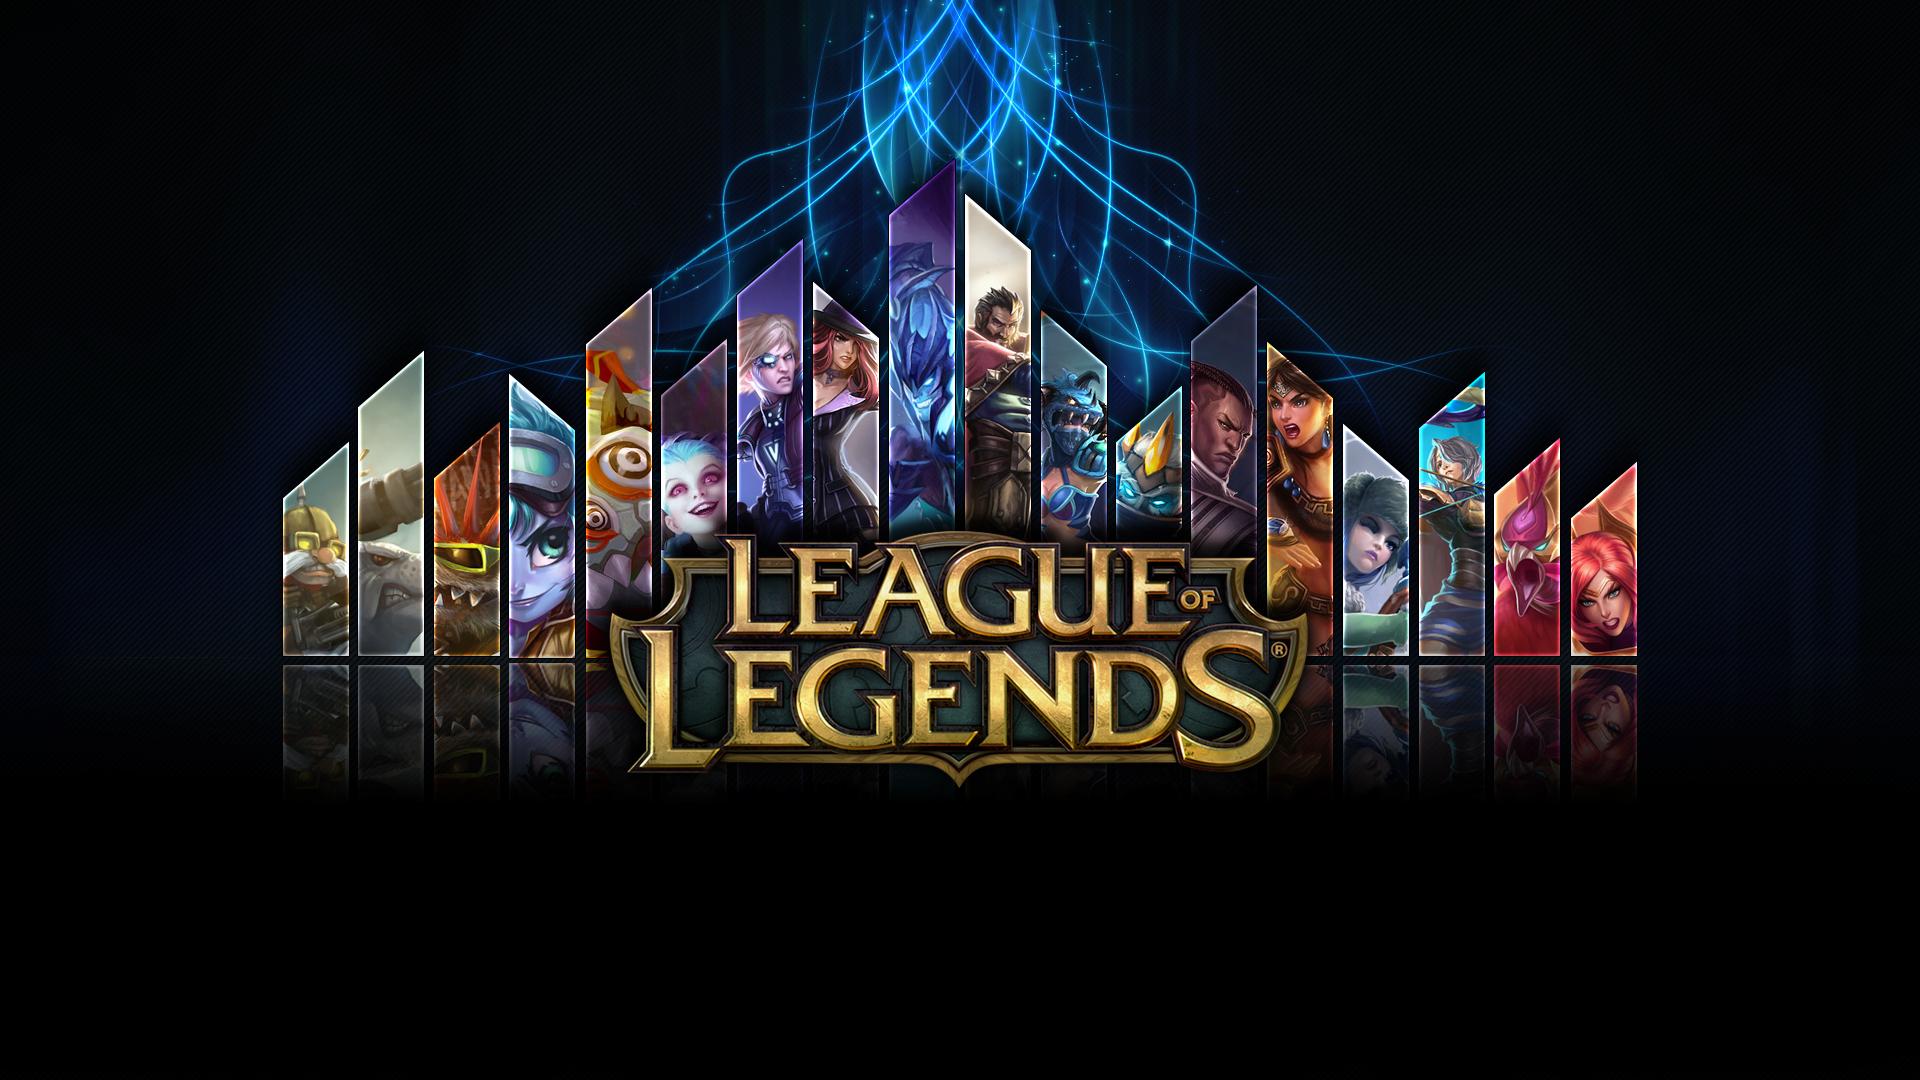 League of Legends ADC Wallpaper - WallpaperSafari